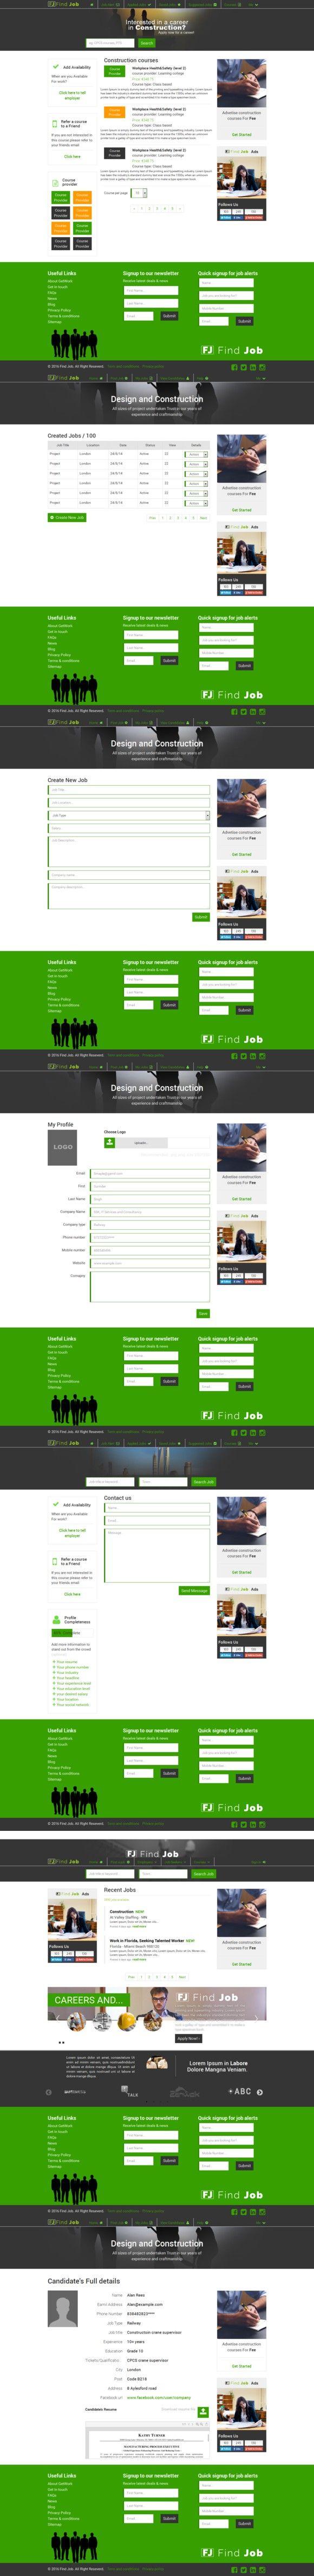 The mentor network employee portal - Best 25 Job Portal Ideas On Pinterest Government Portal Job Employment And Get A Job Online